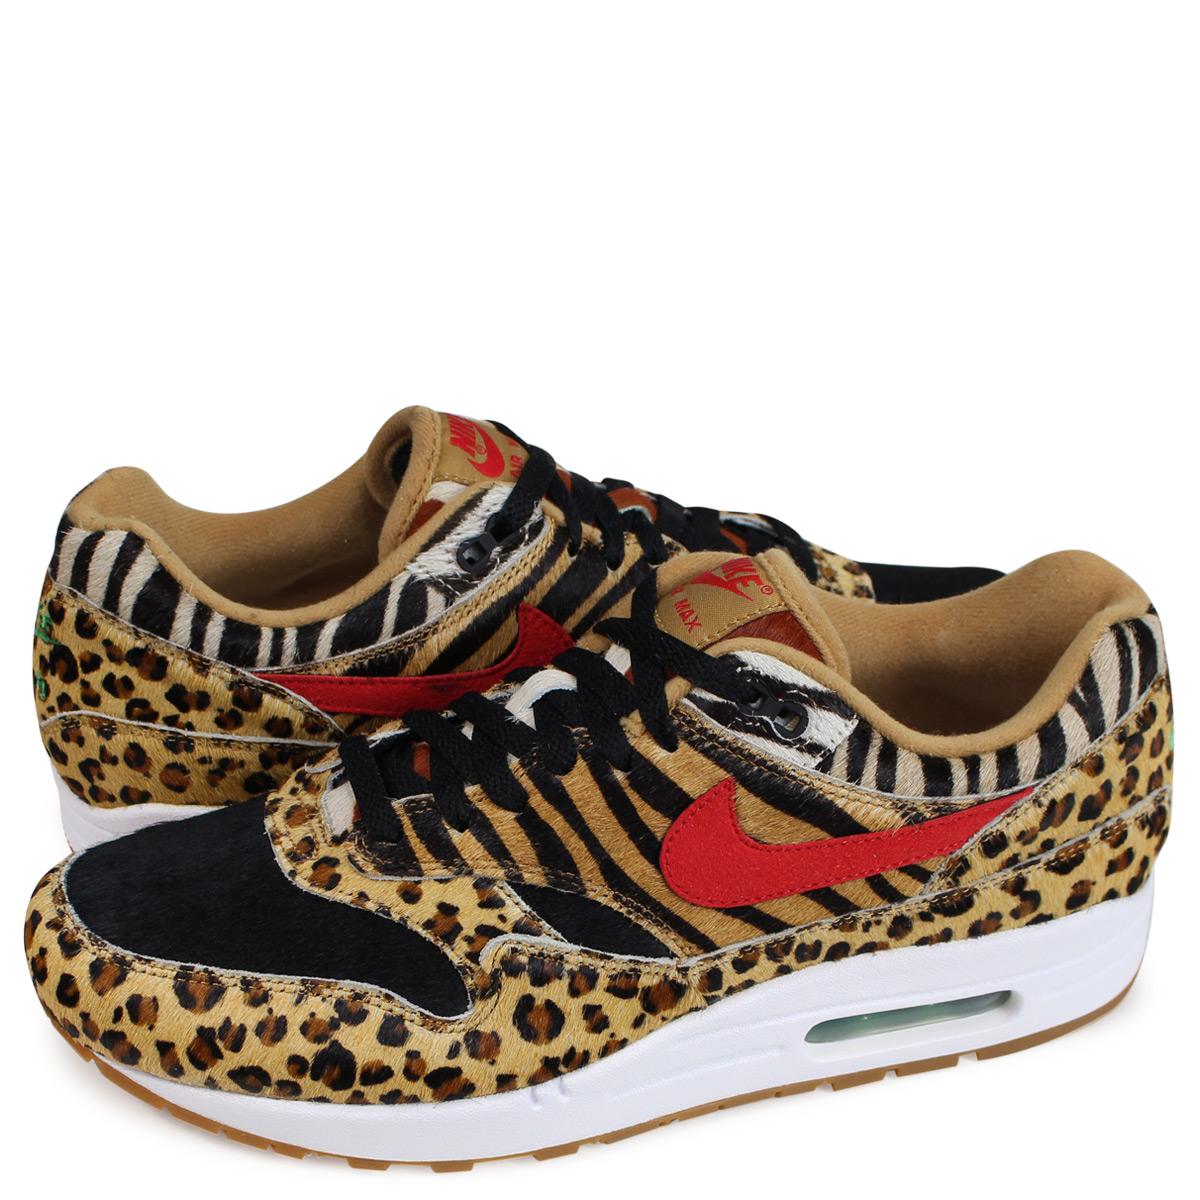 ALLSPORTS  NIKE AIR MAX 1 DLX ANIMAL PACK Kie Ney AMAX 1 sneakers men  AQ0928-700 ウィート  1810   8f95ca31d